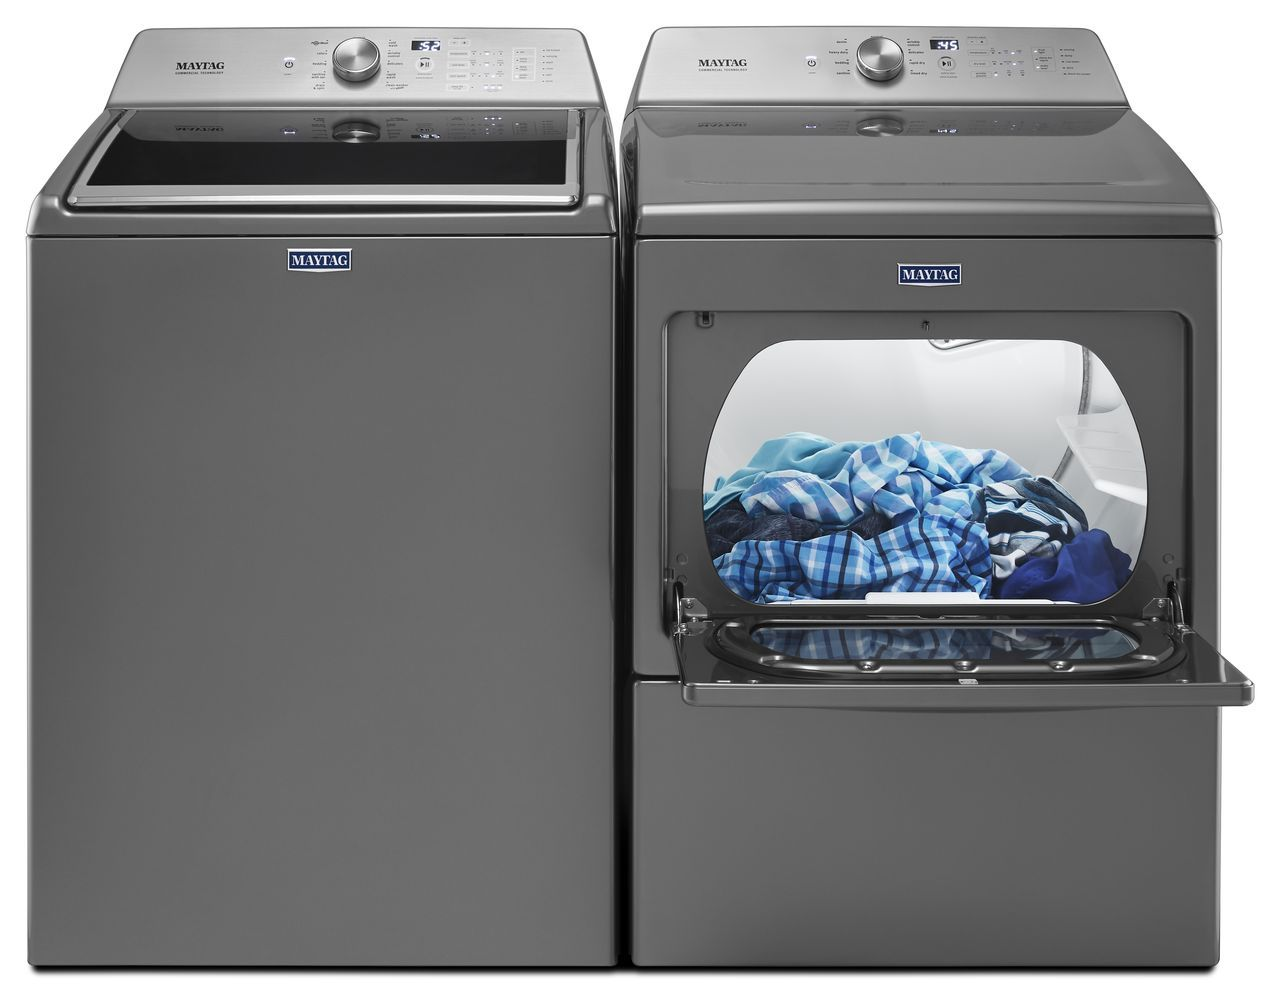 Maytag Top Load Washer Metallic Slate Mvwb765fc Home Appliance Agitator Basket And Tub Diagram Parts List For Whirlpool